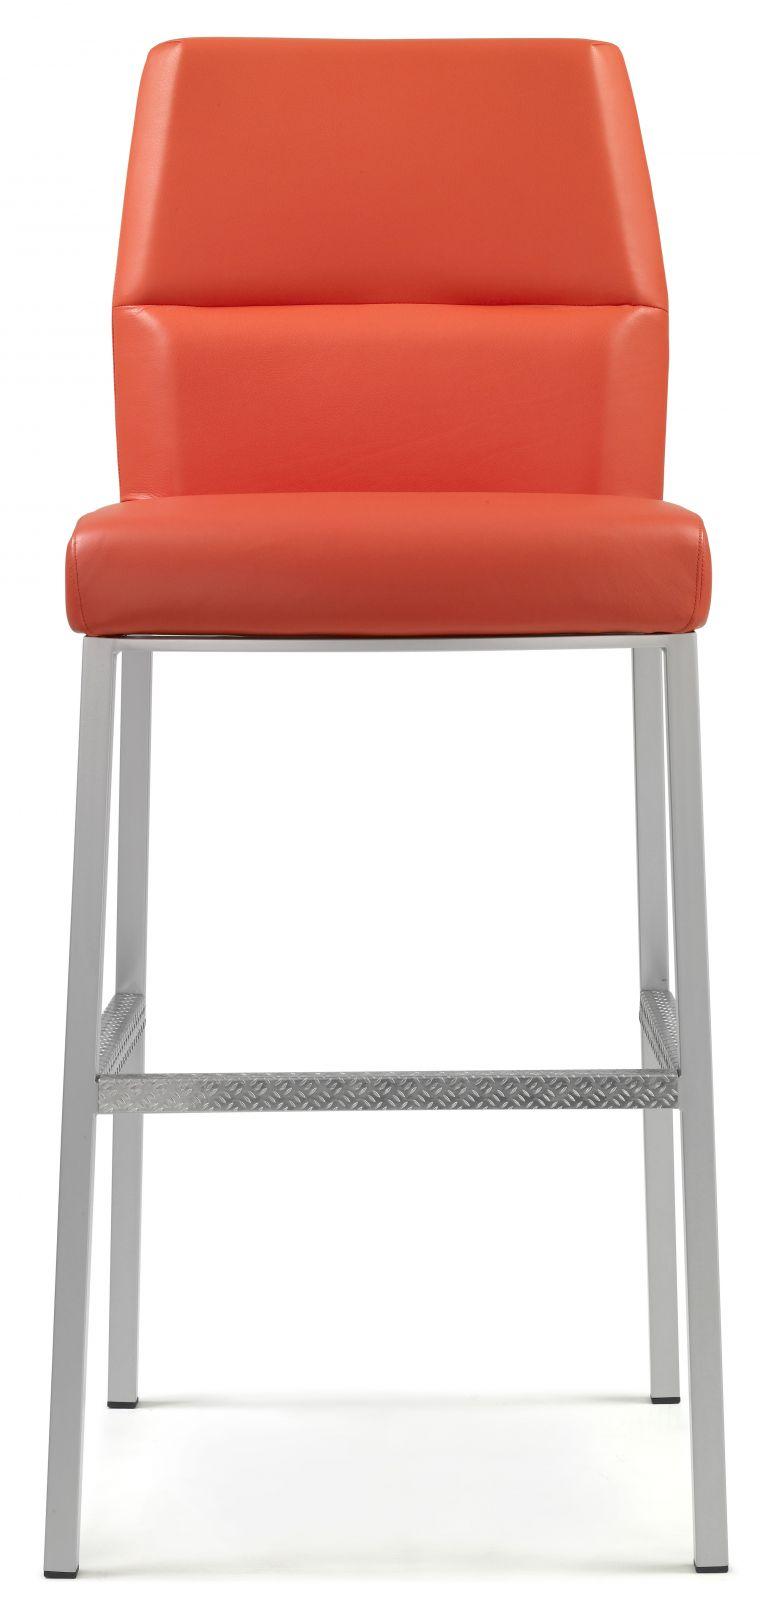 modern-bar-stools-Italian-furniture-large (30).jpg